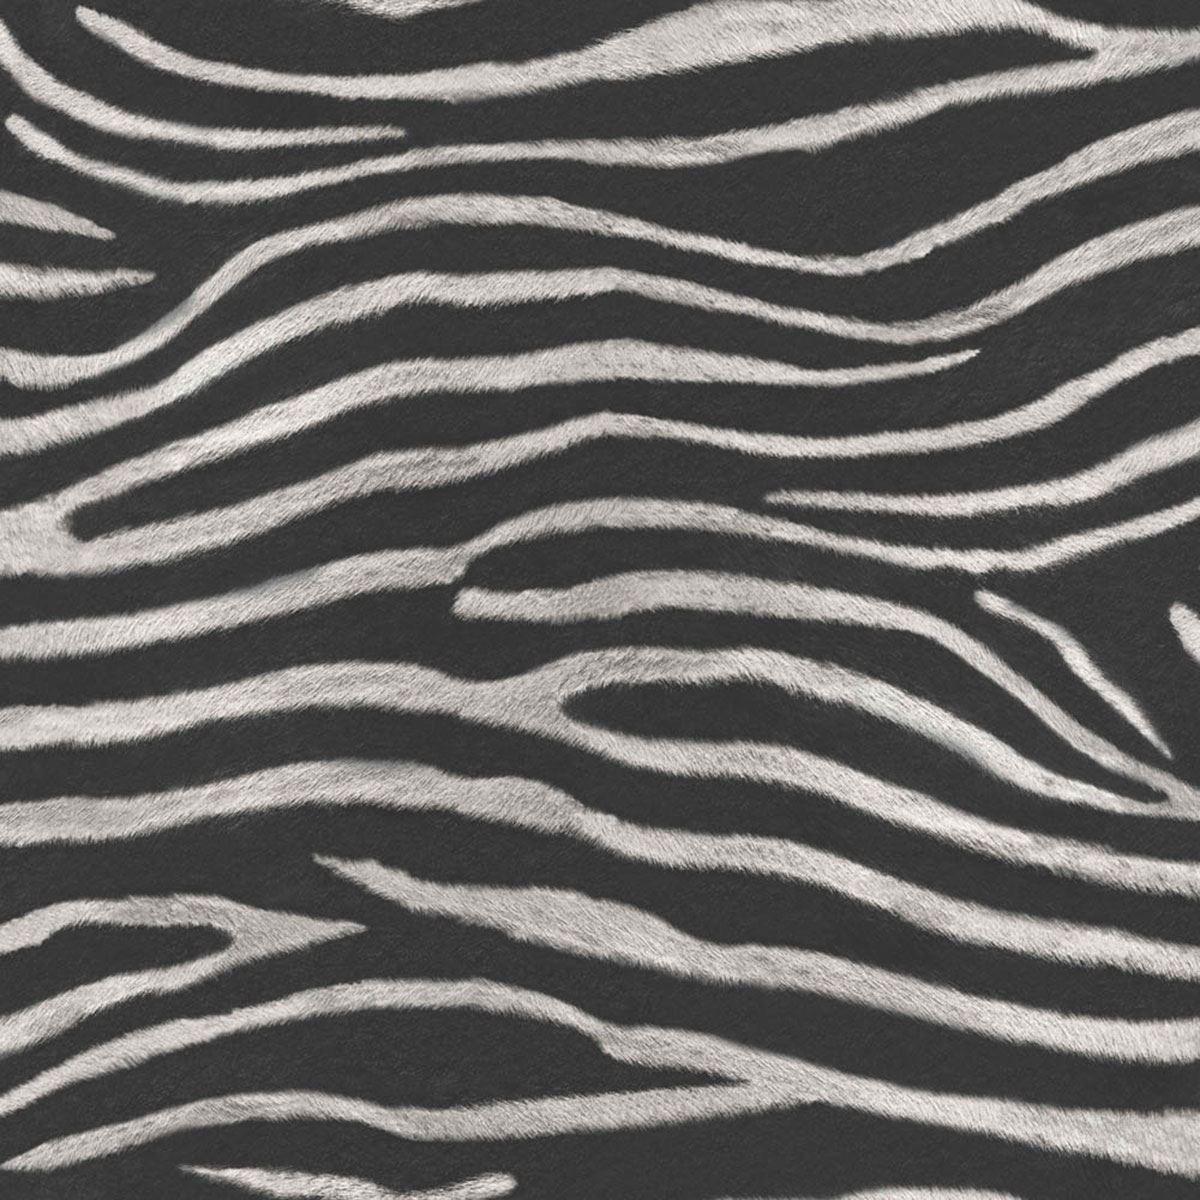 /Papier Peint Art House 670300 Tropiques Serengeti Zebra Imprimer/ /Noir/